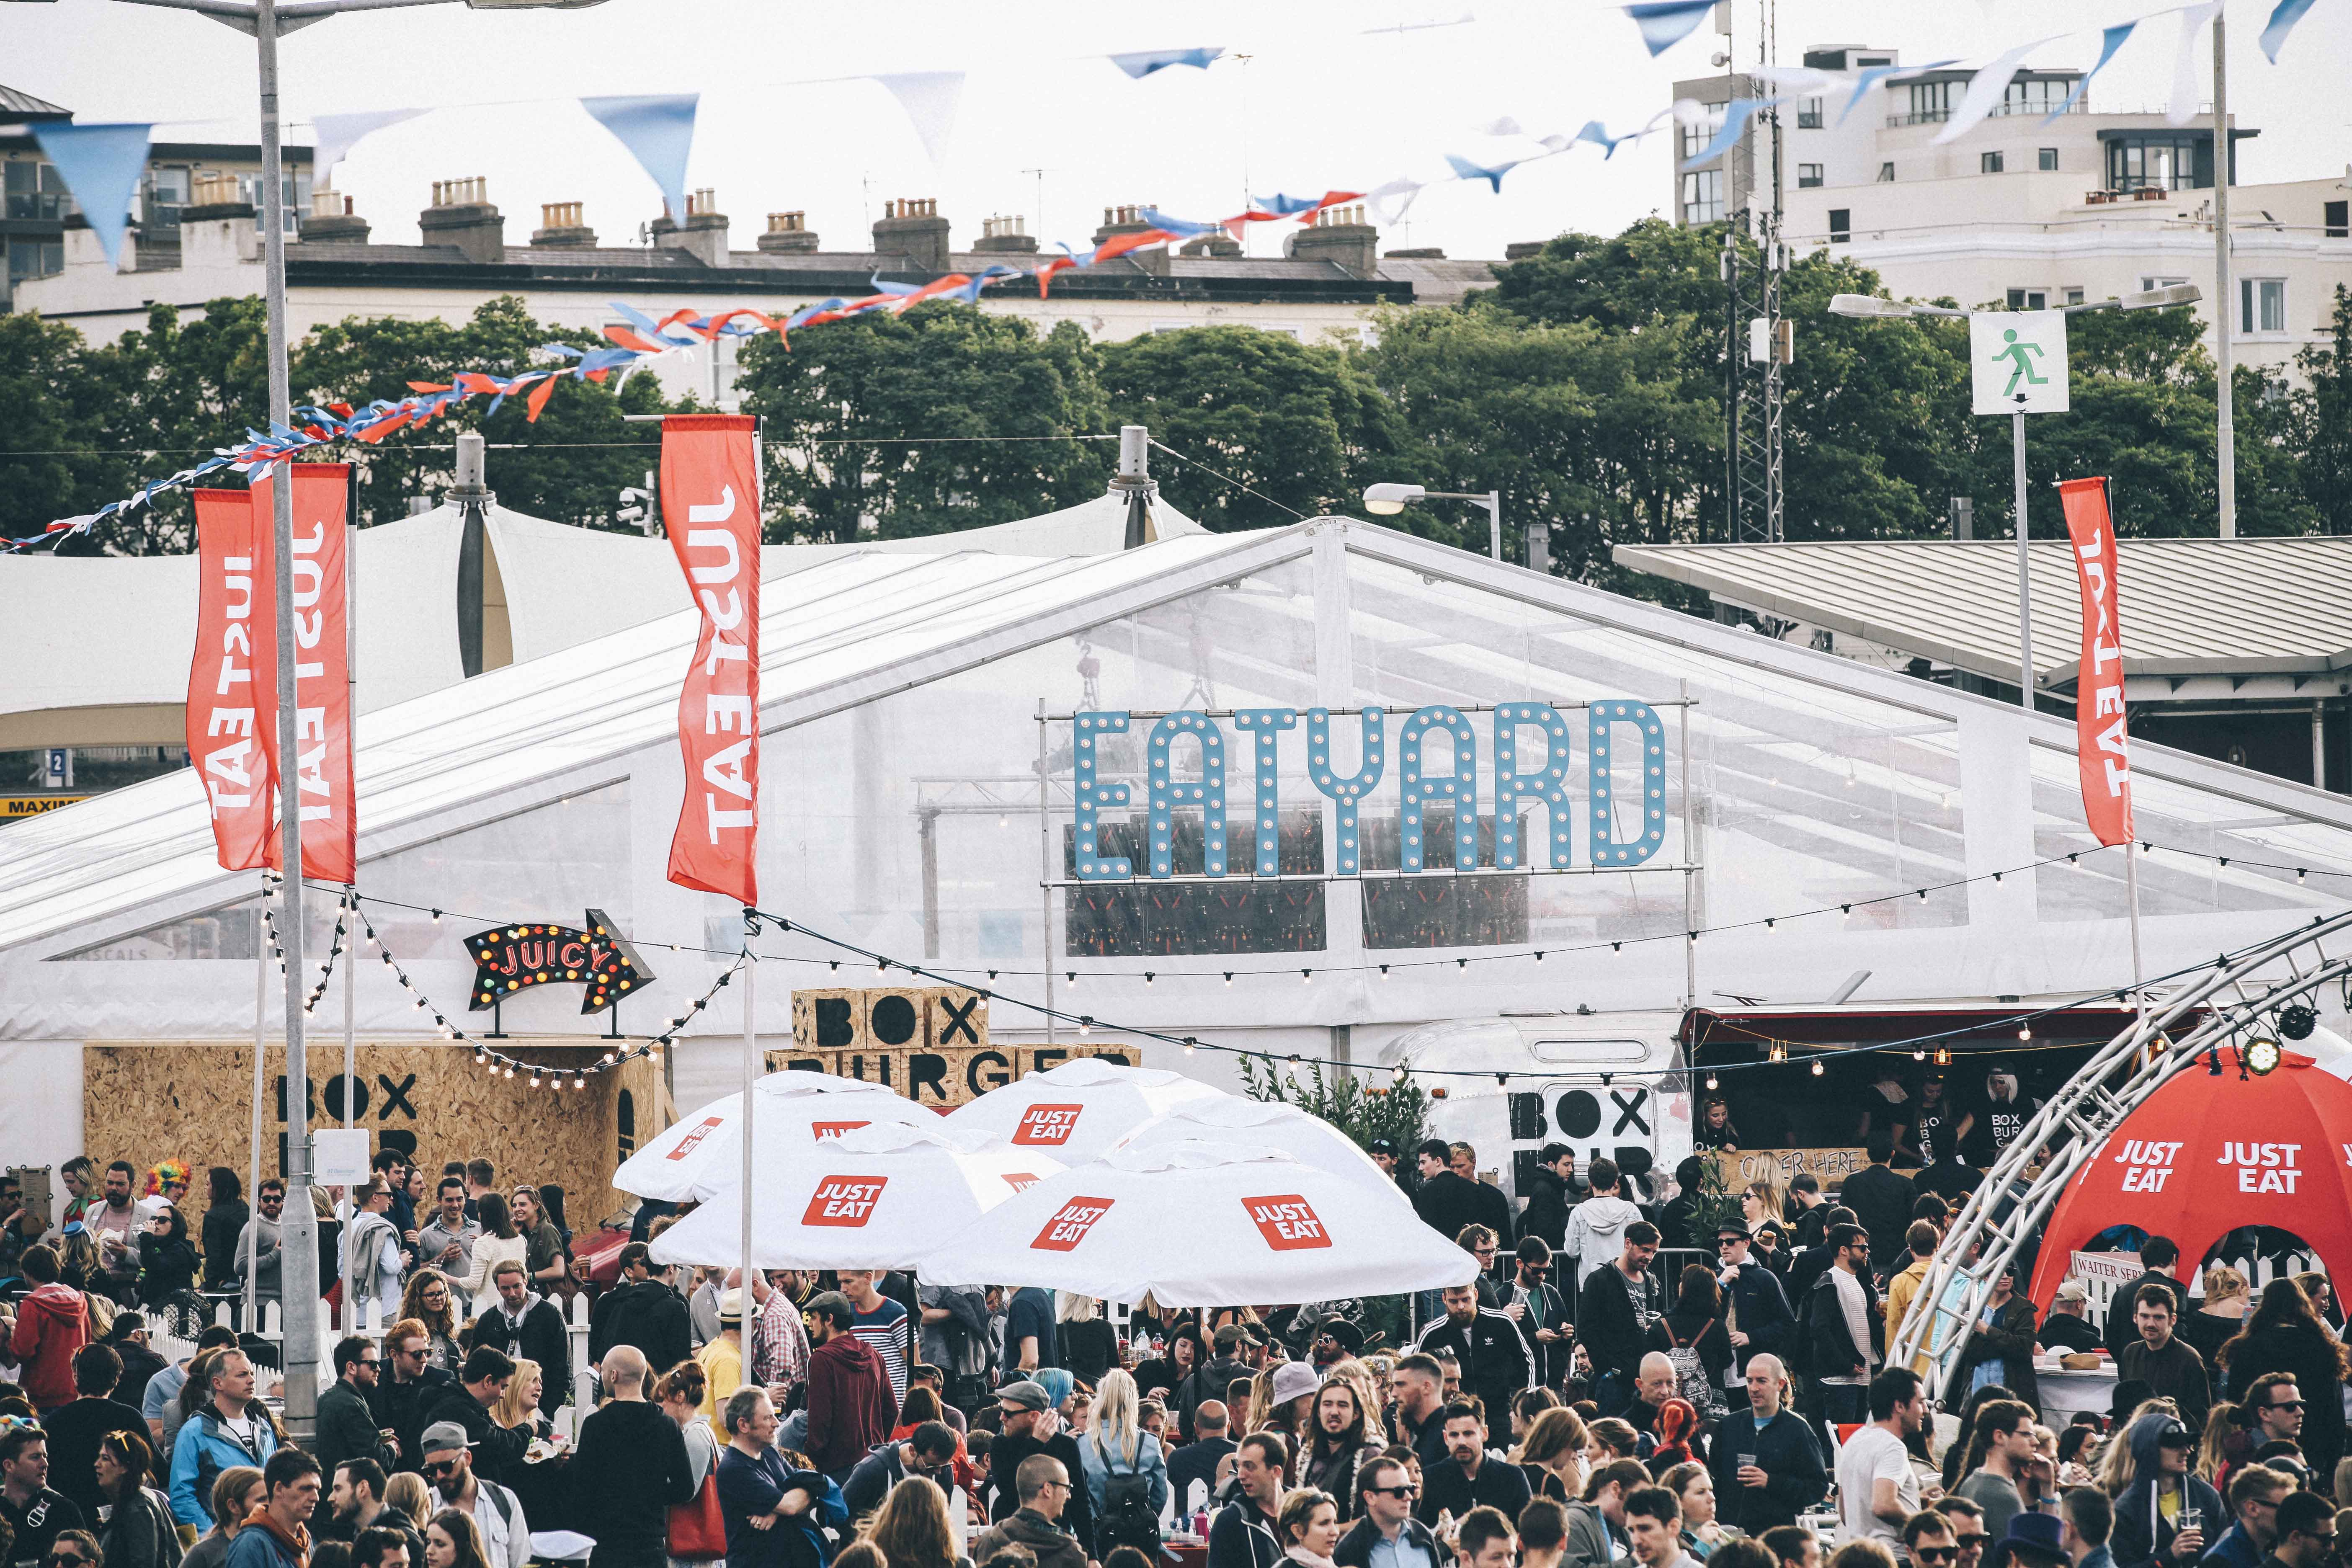 Eatyard crowd